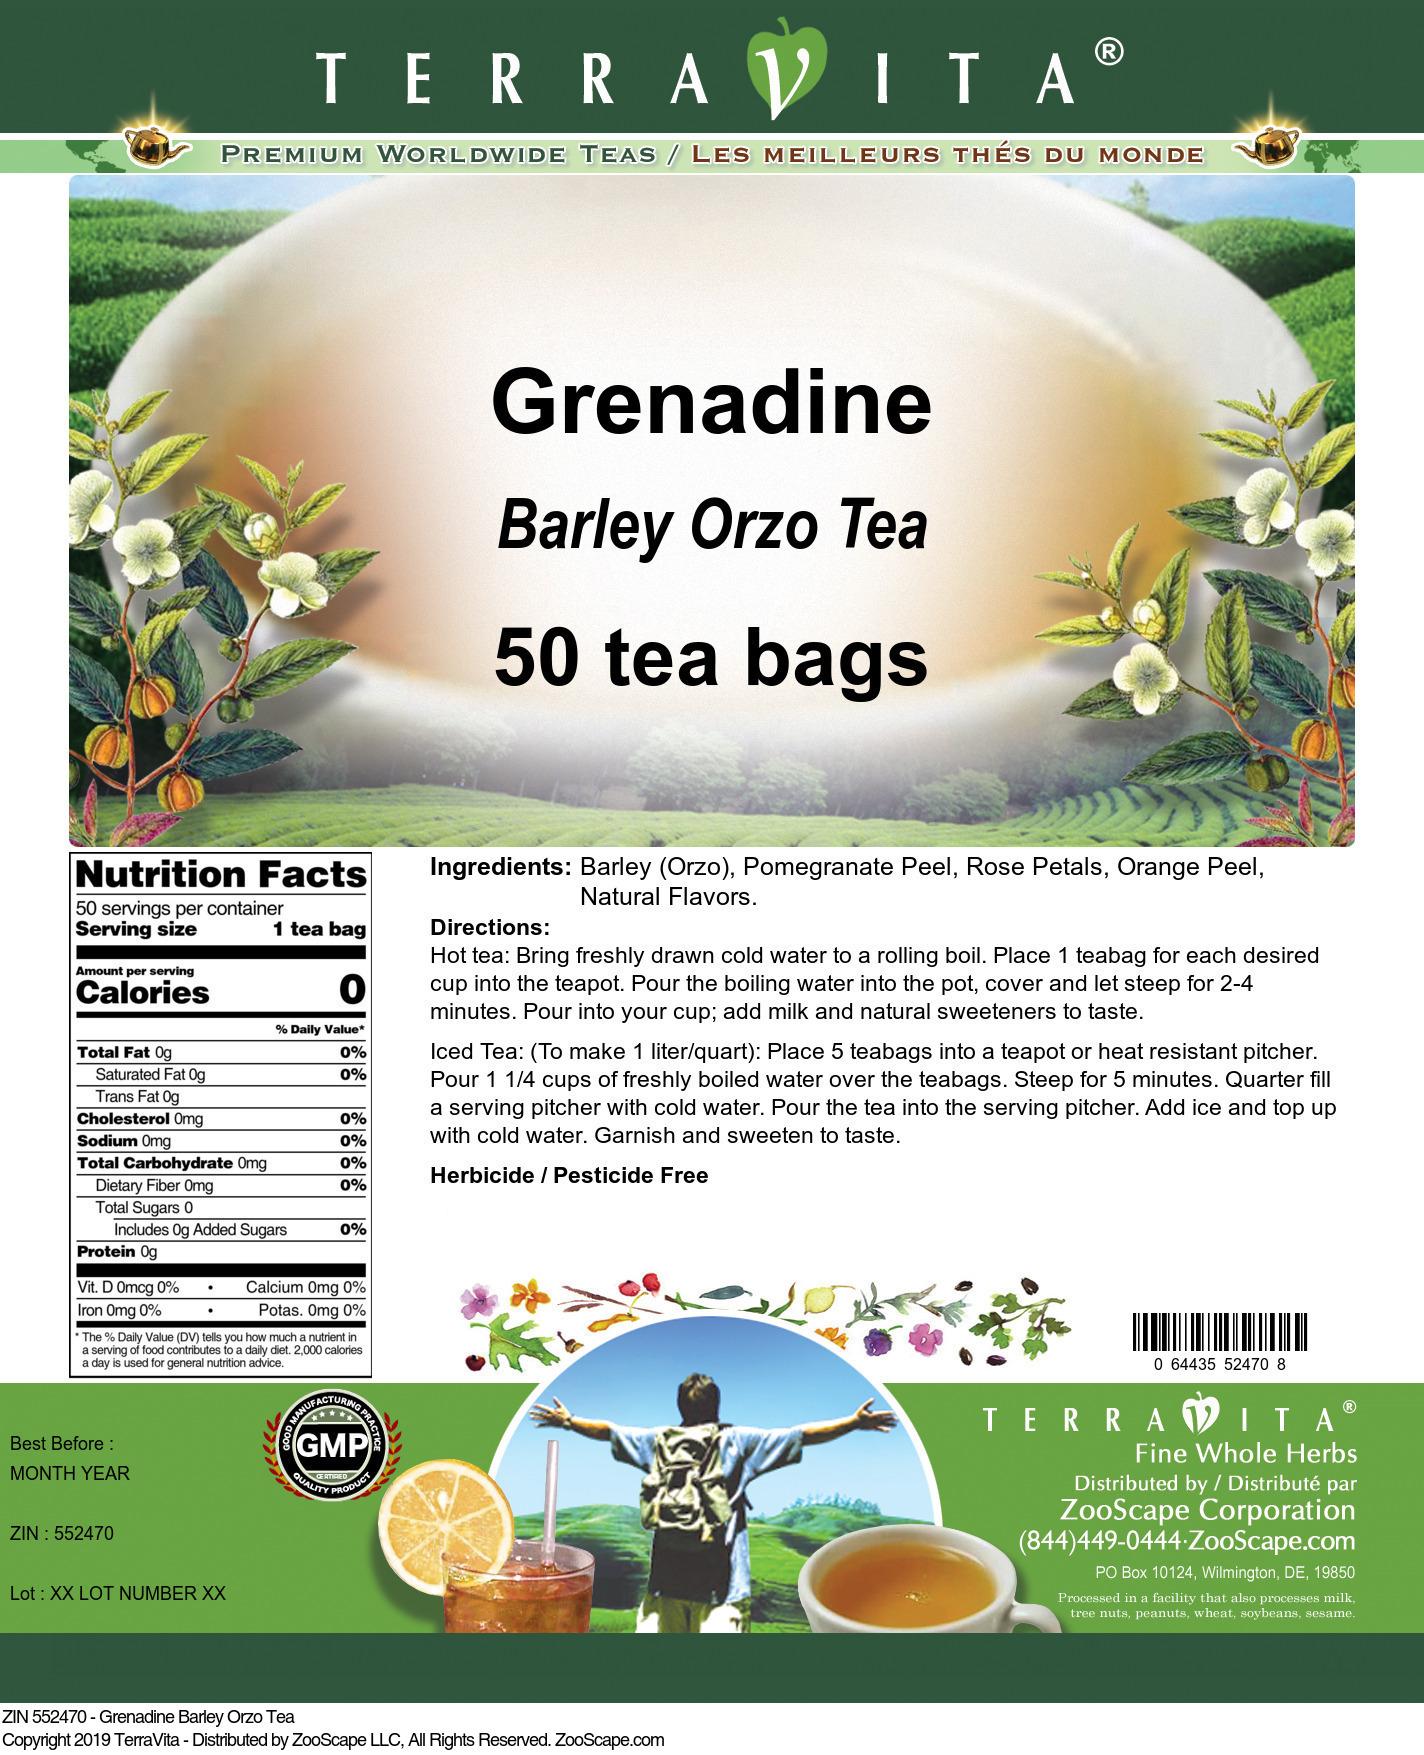 Grenadine Barley Orzo Tea